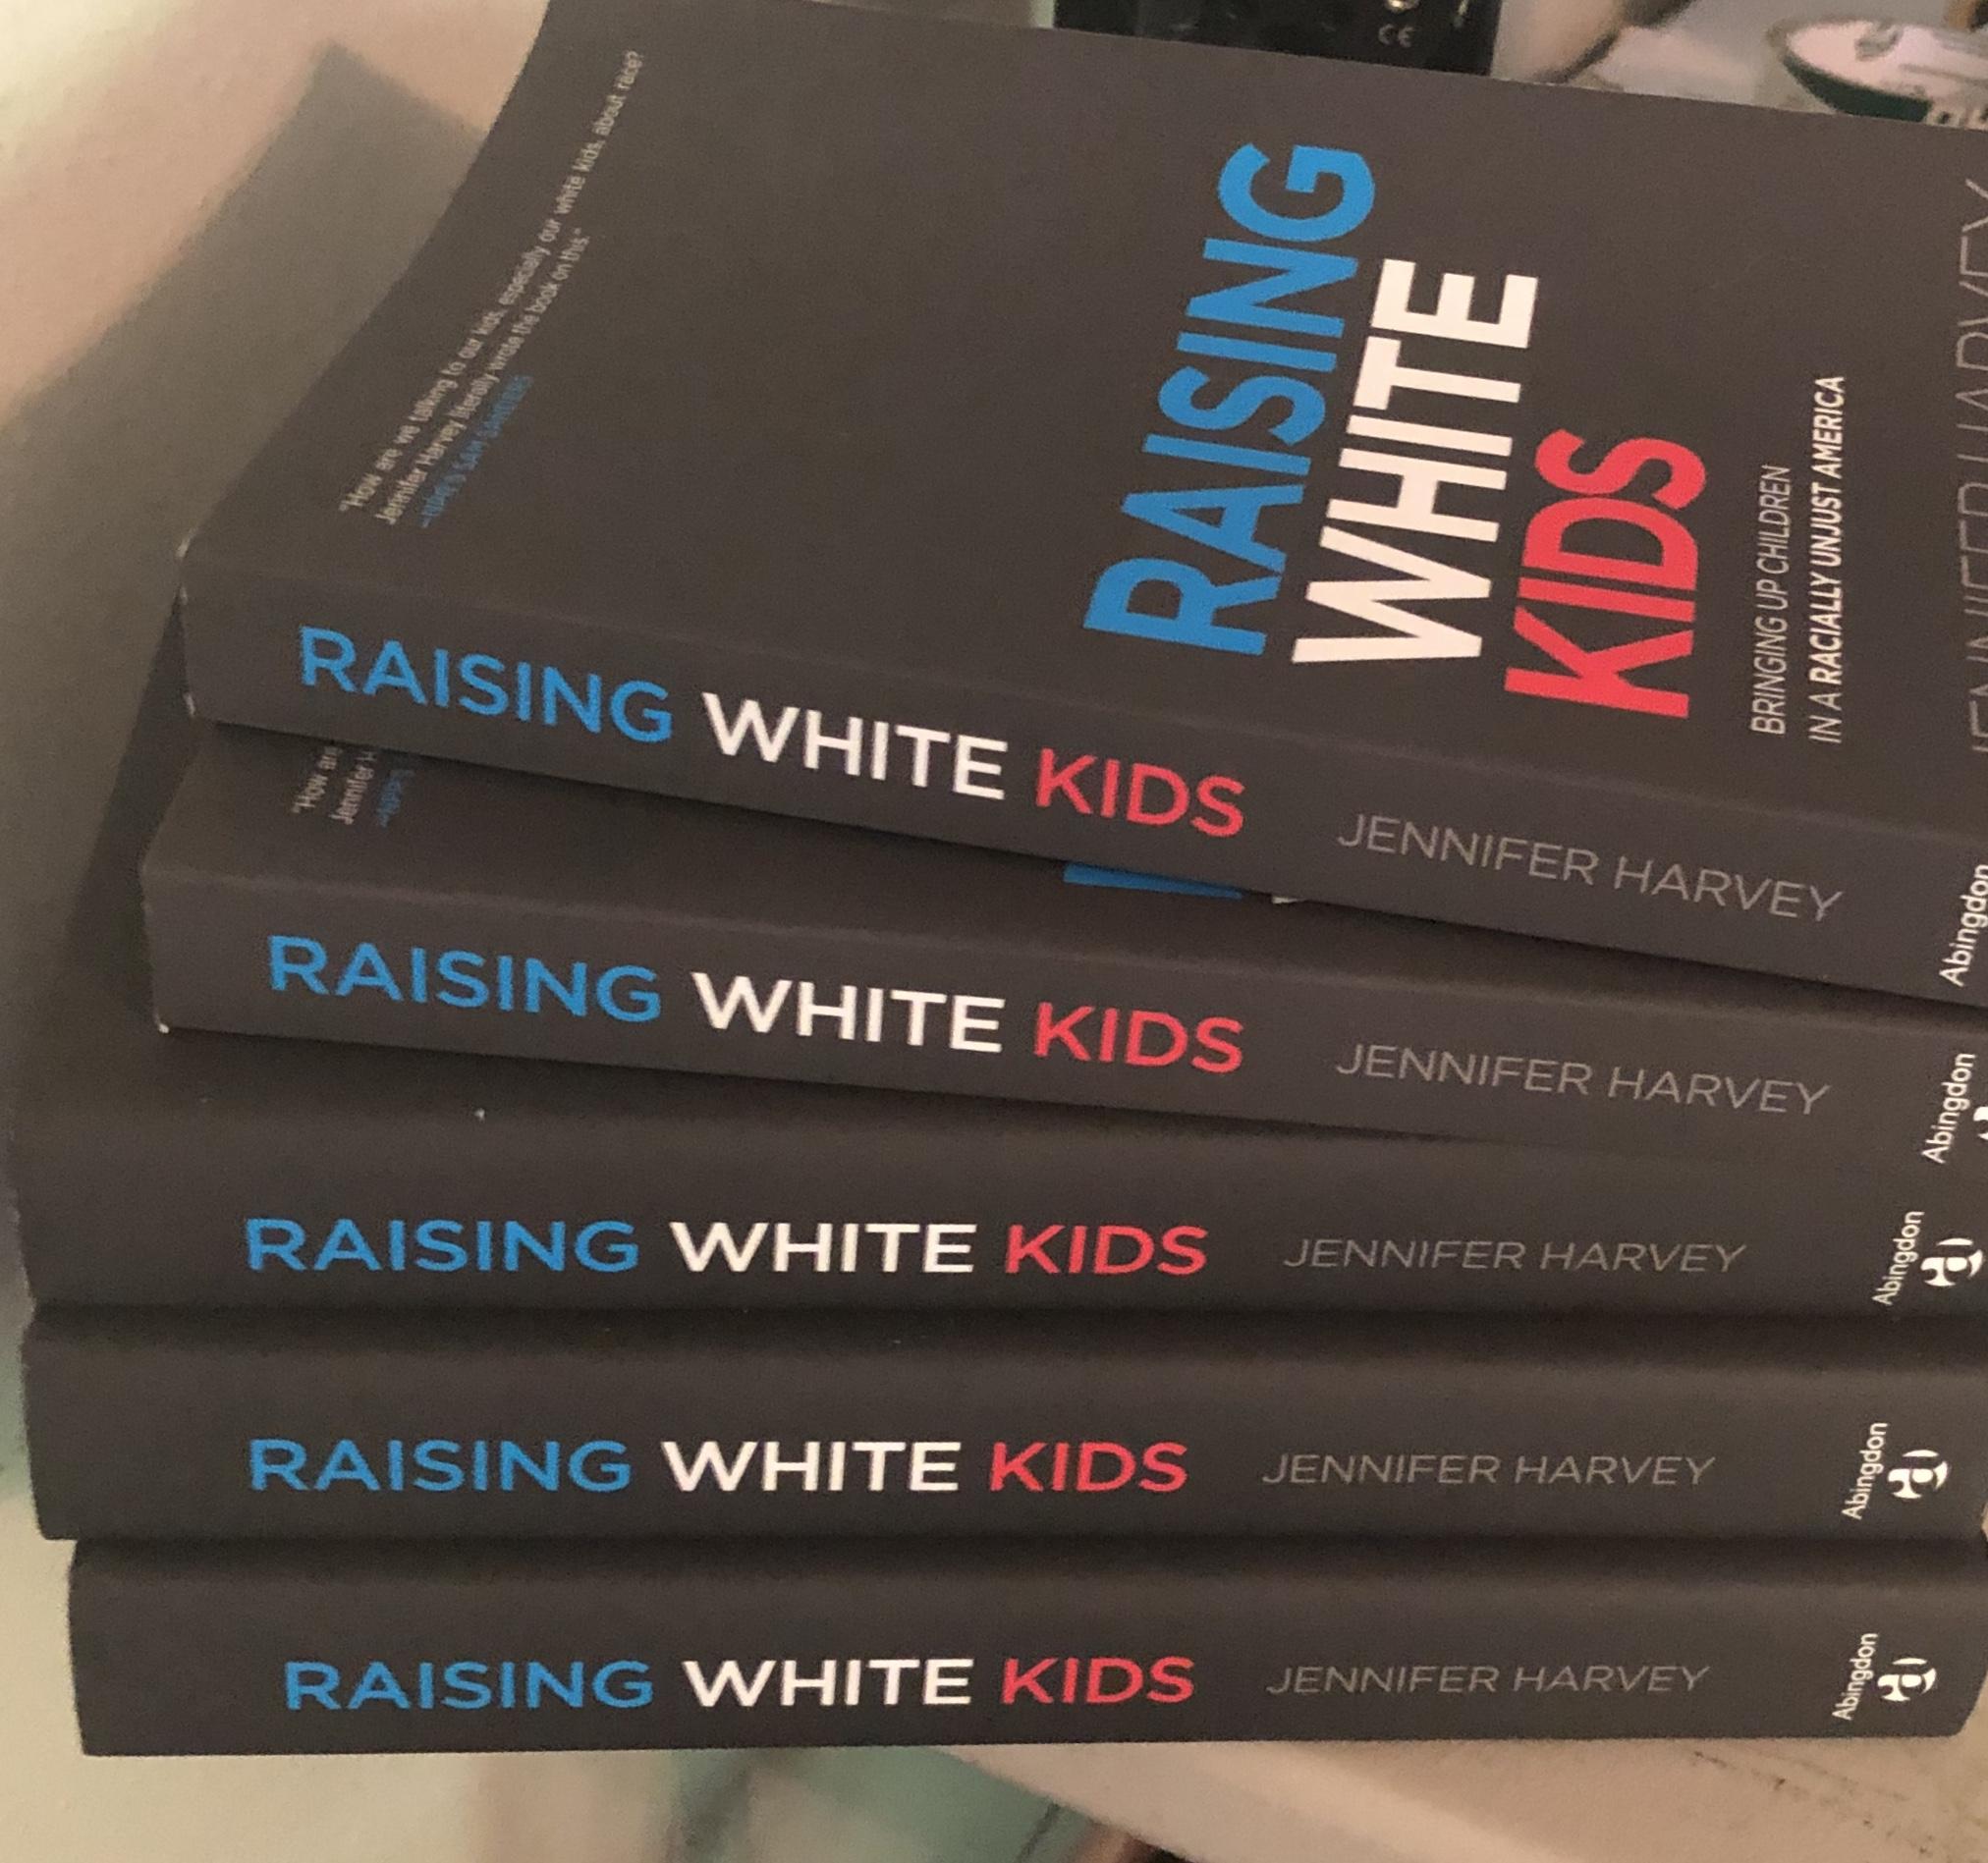 Image of book raising white kids.